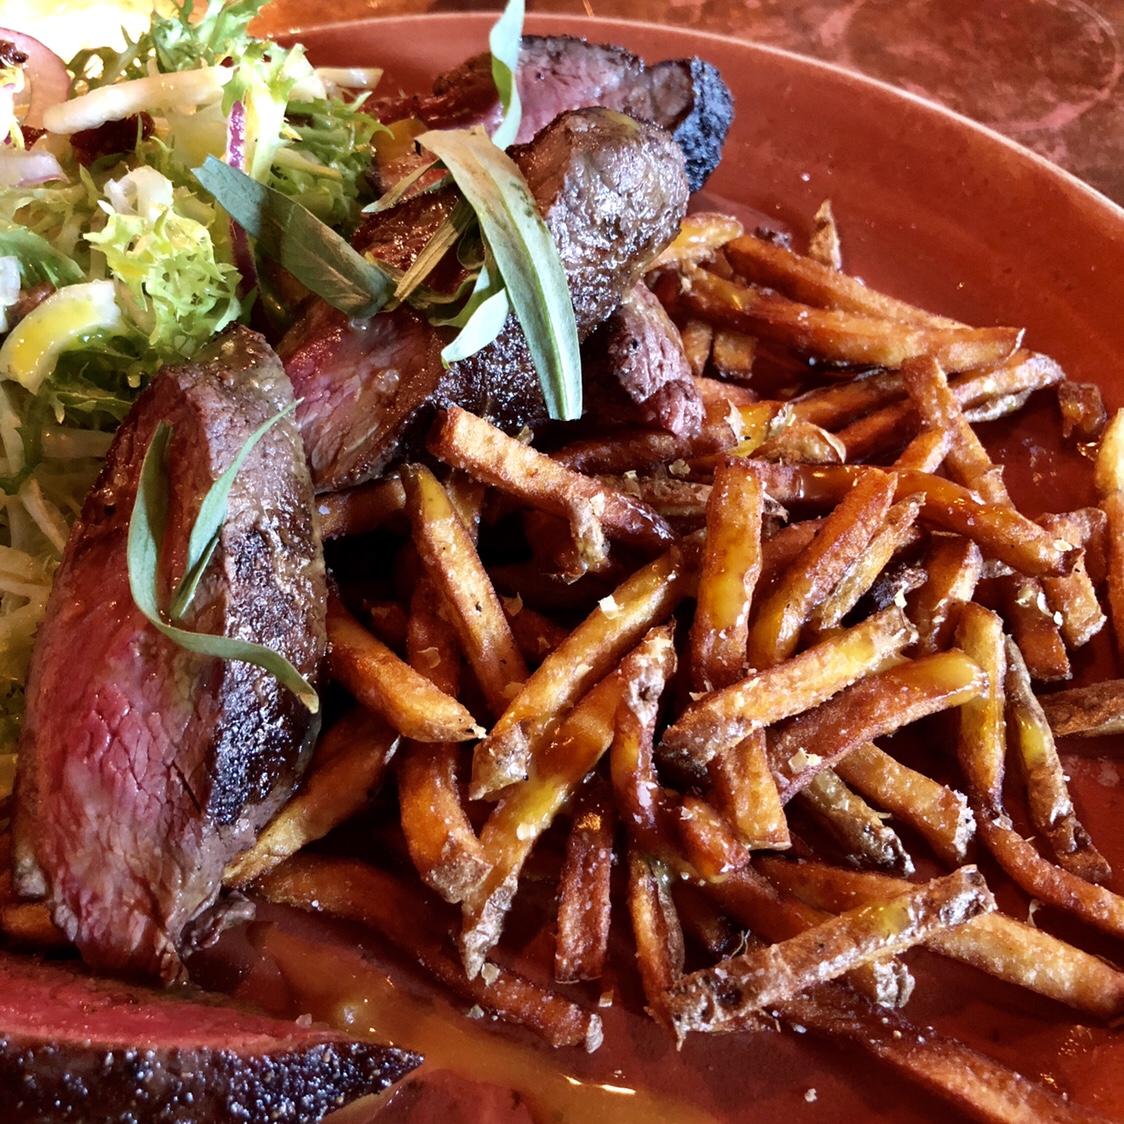 8 oz Culotte Steak Frites | Buffalo Proper #buffaloproper #buffalony #buffalo #westernny #buffaloeats